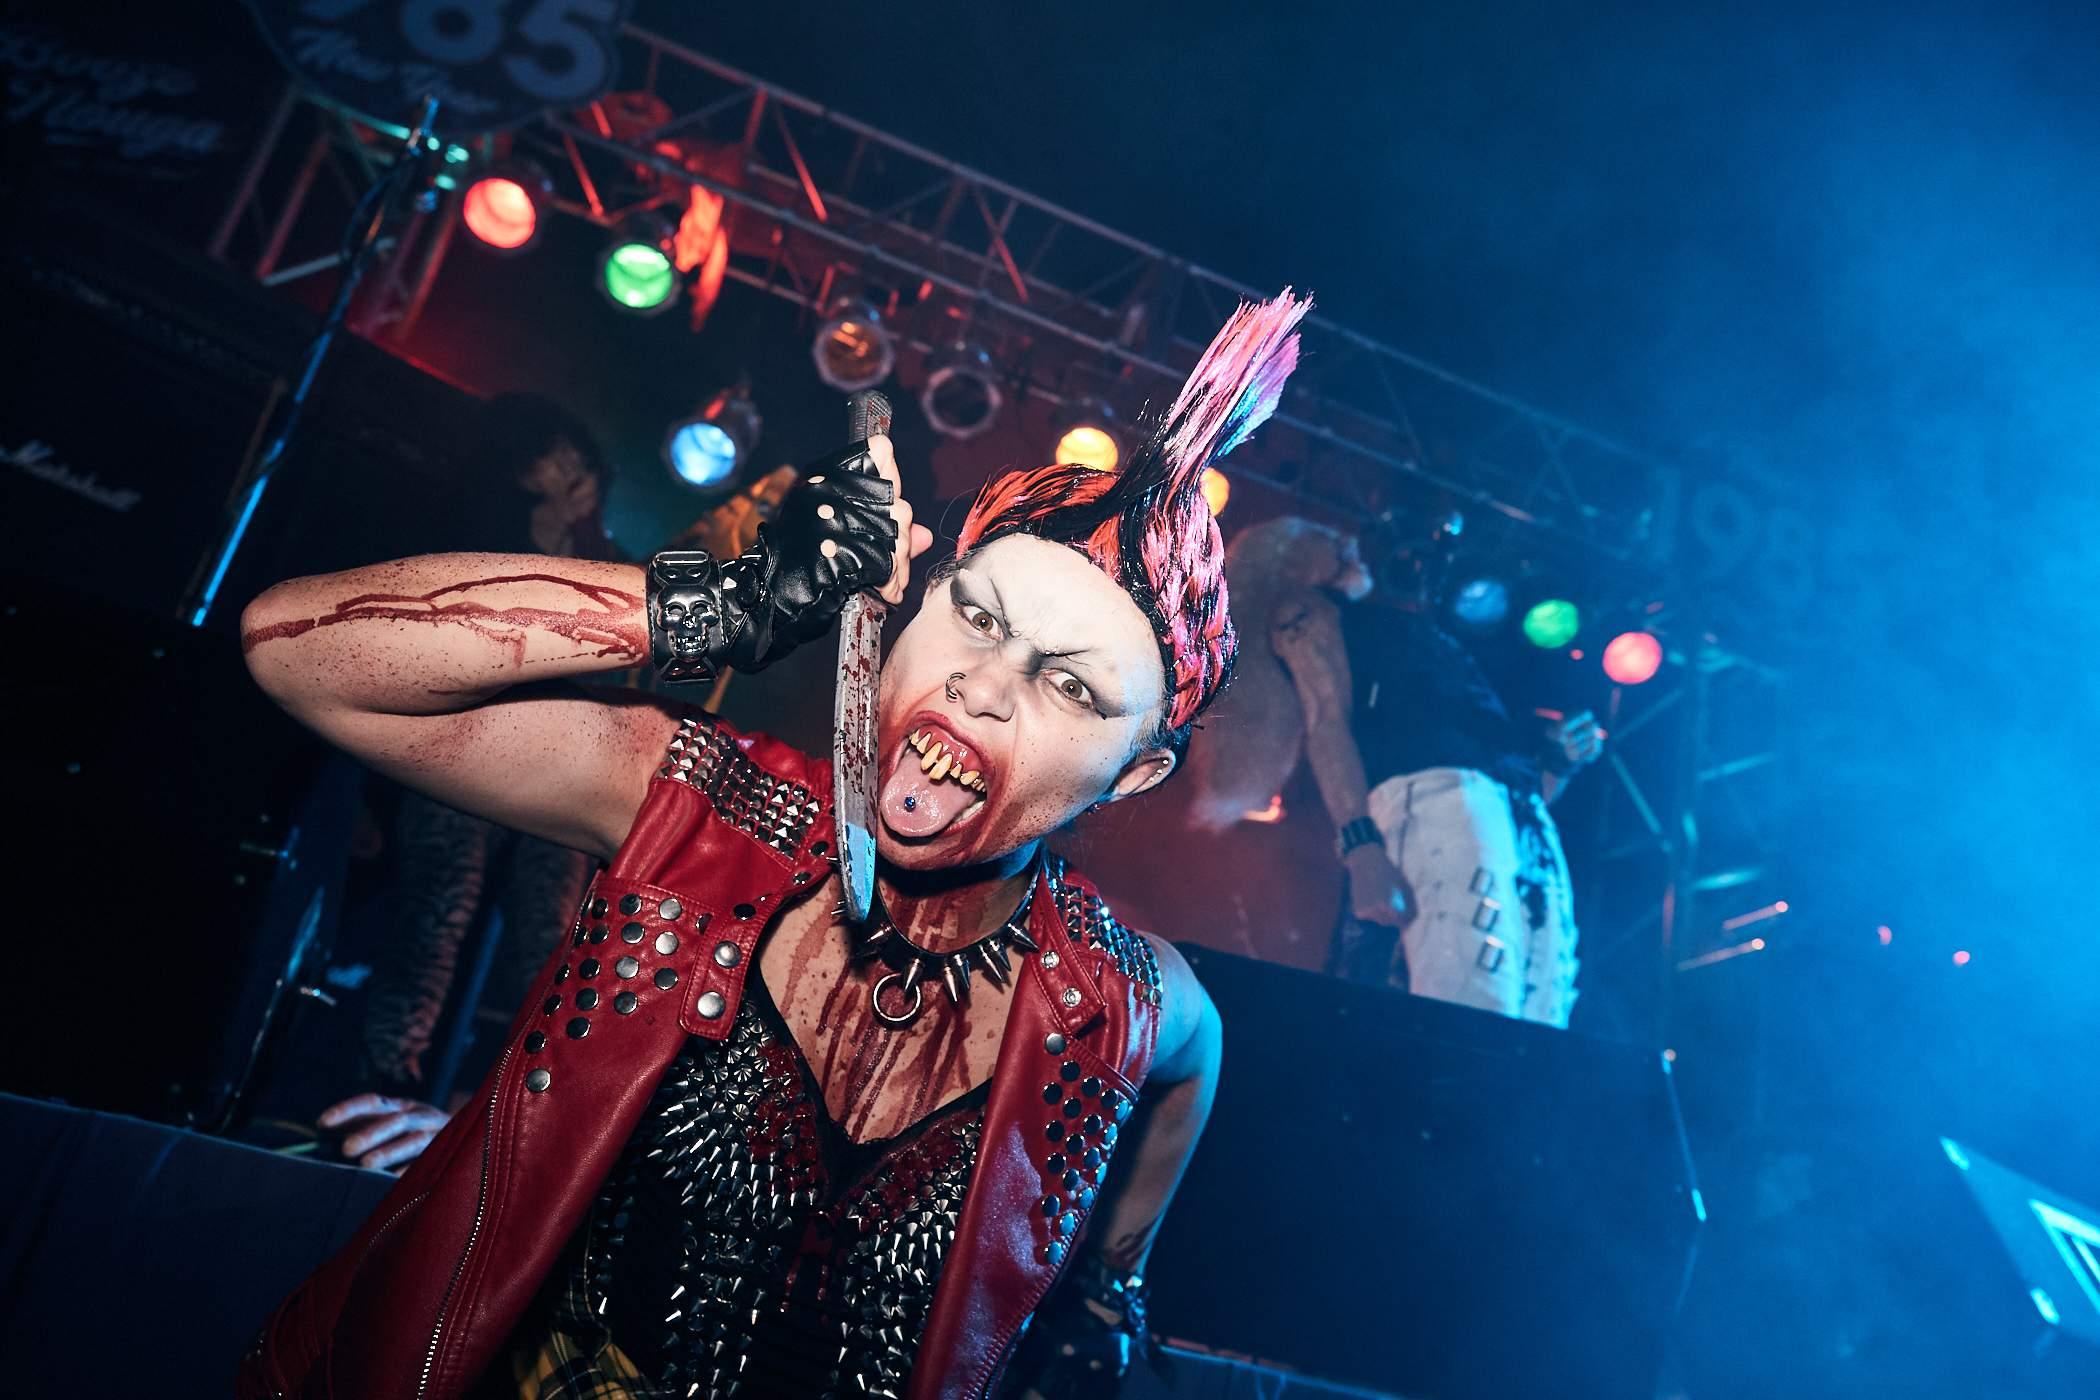 Howl O Scream Or Halloween Horror Nights 2020 Halloween Horror Nights, Howl O Scream look to the '80s and